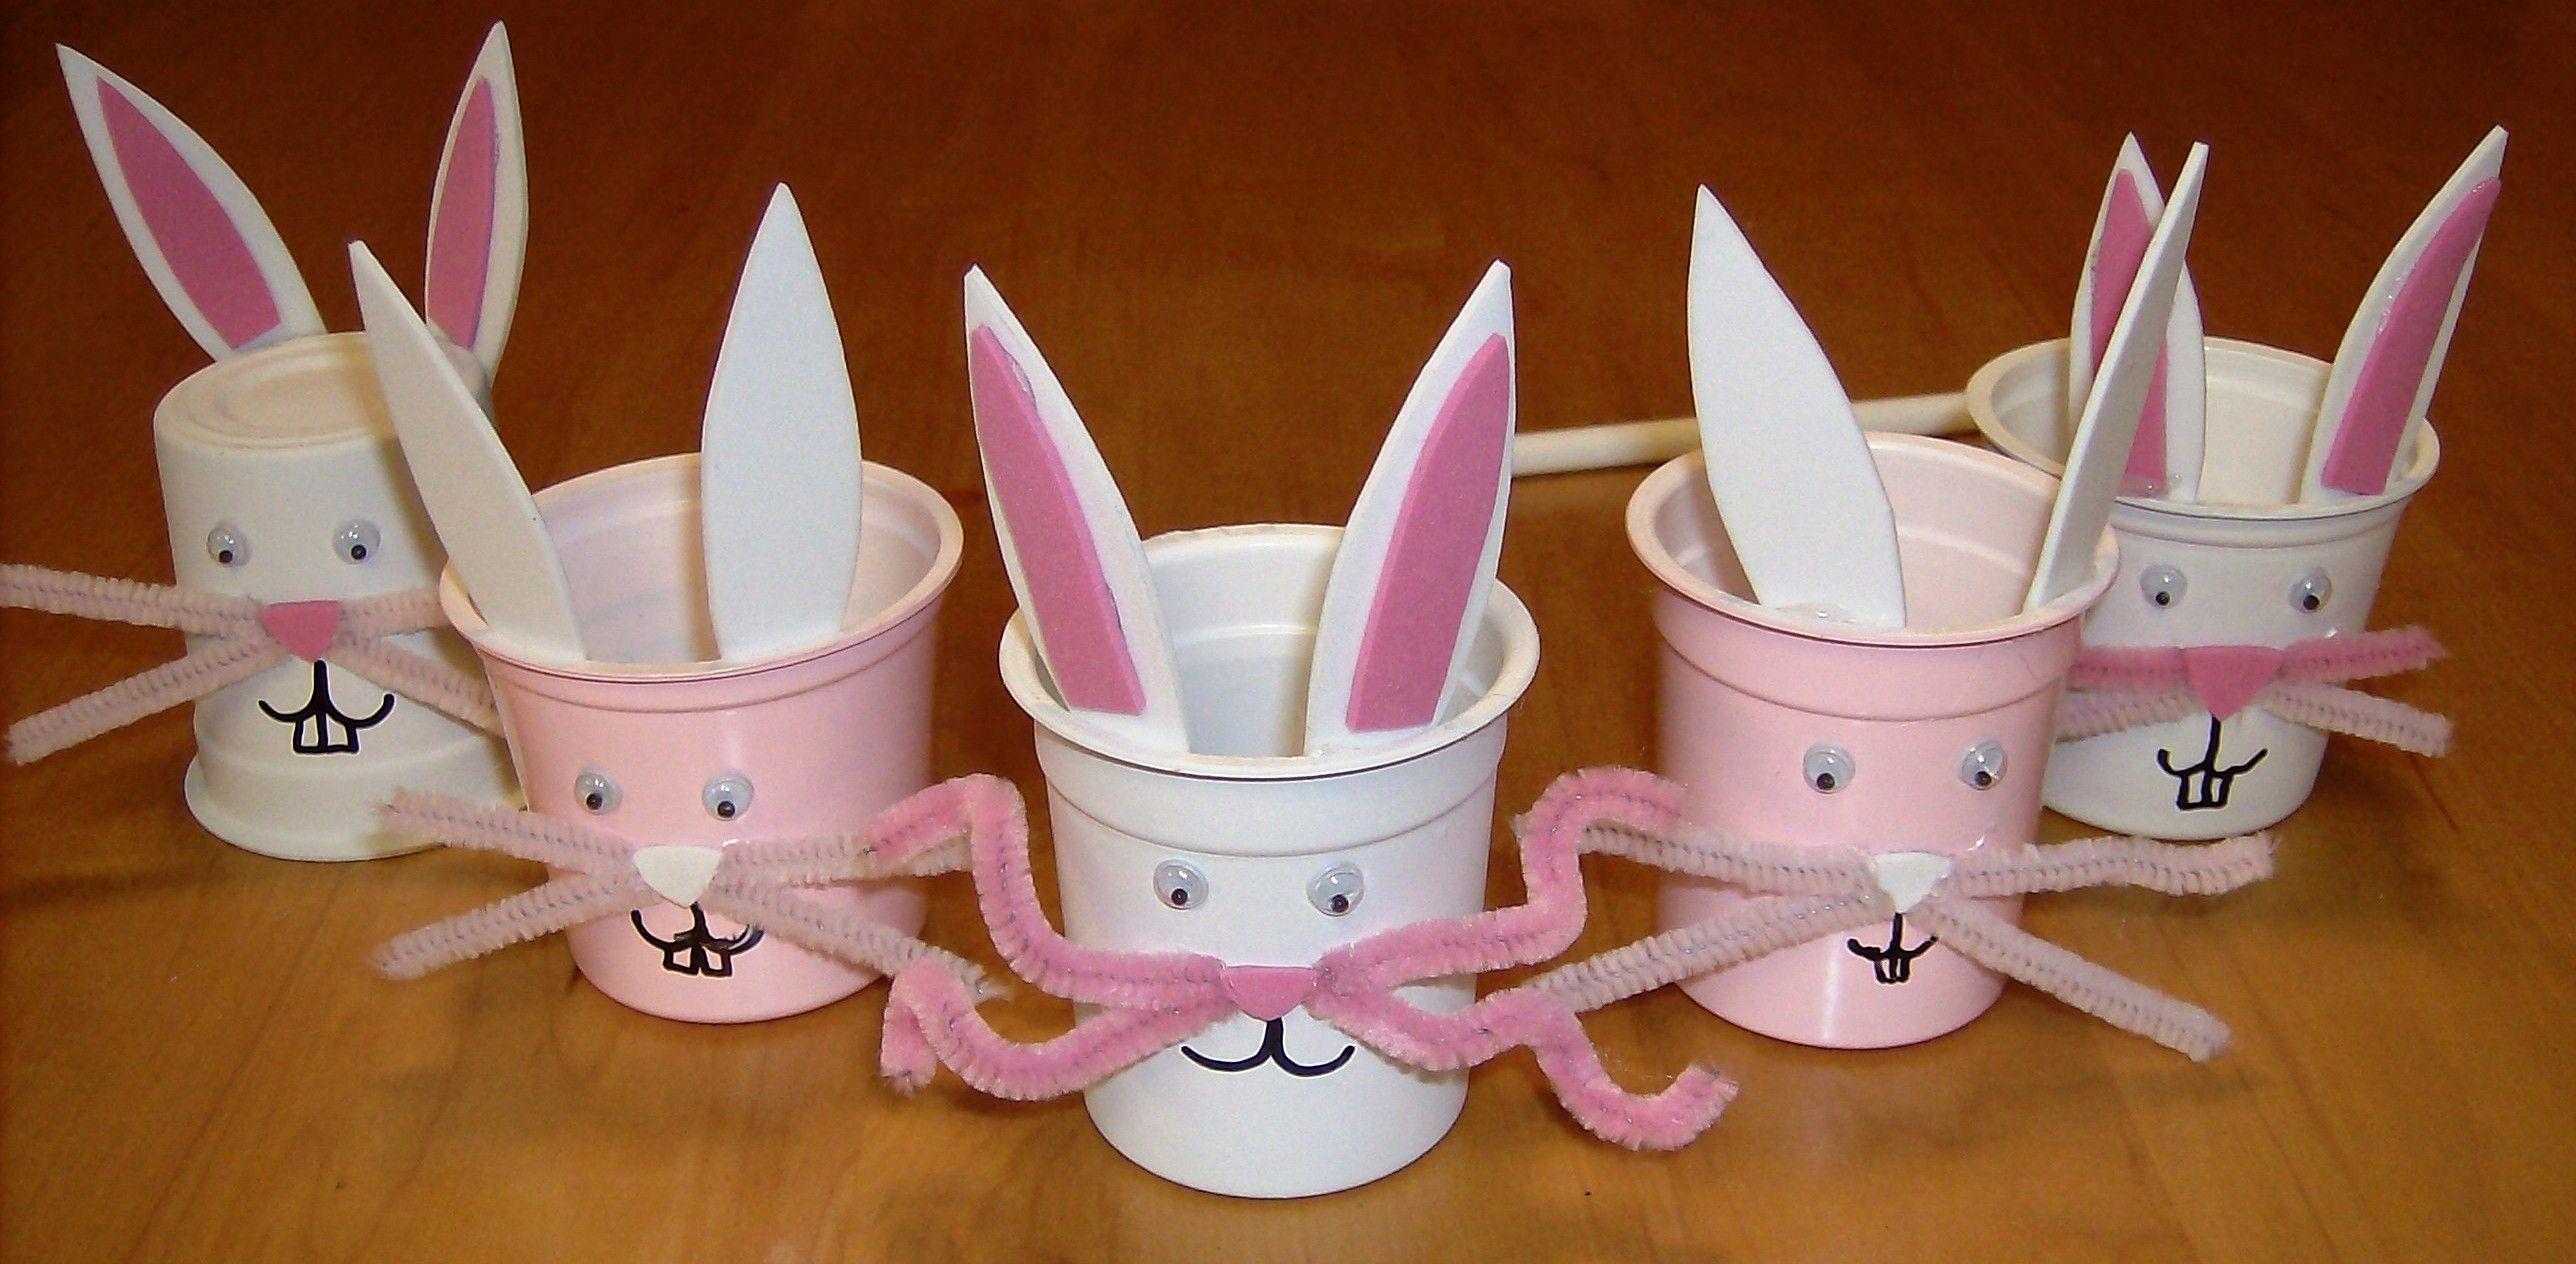 Yogurt Cup Creations K Cup Crafts Cup Crafts Yogurt Cups